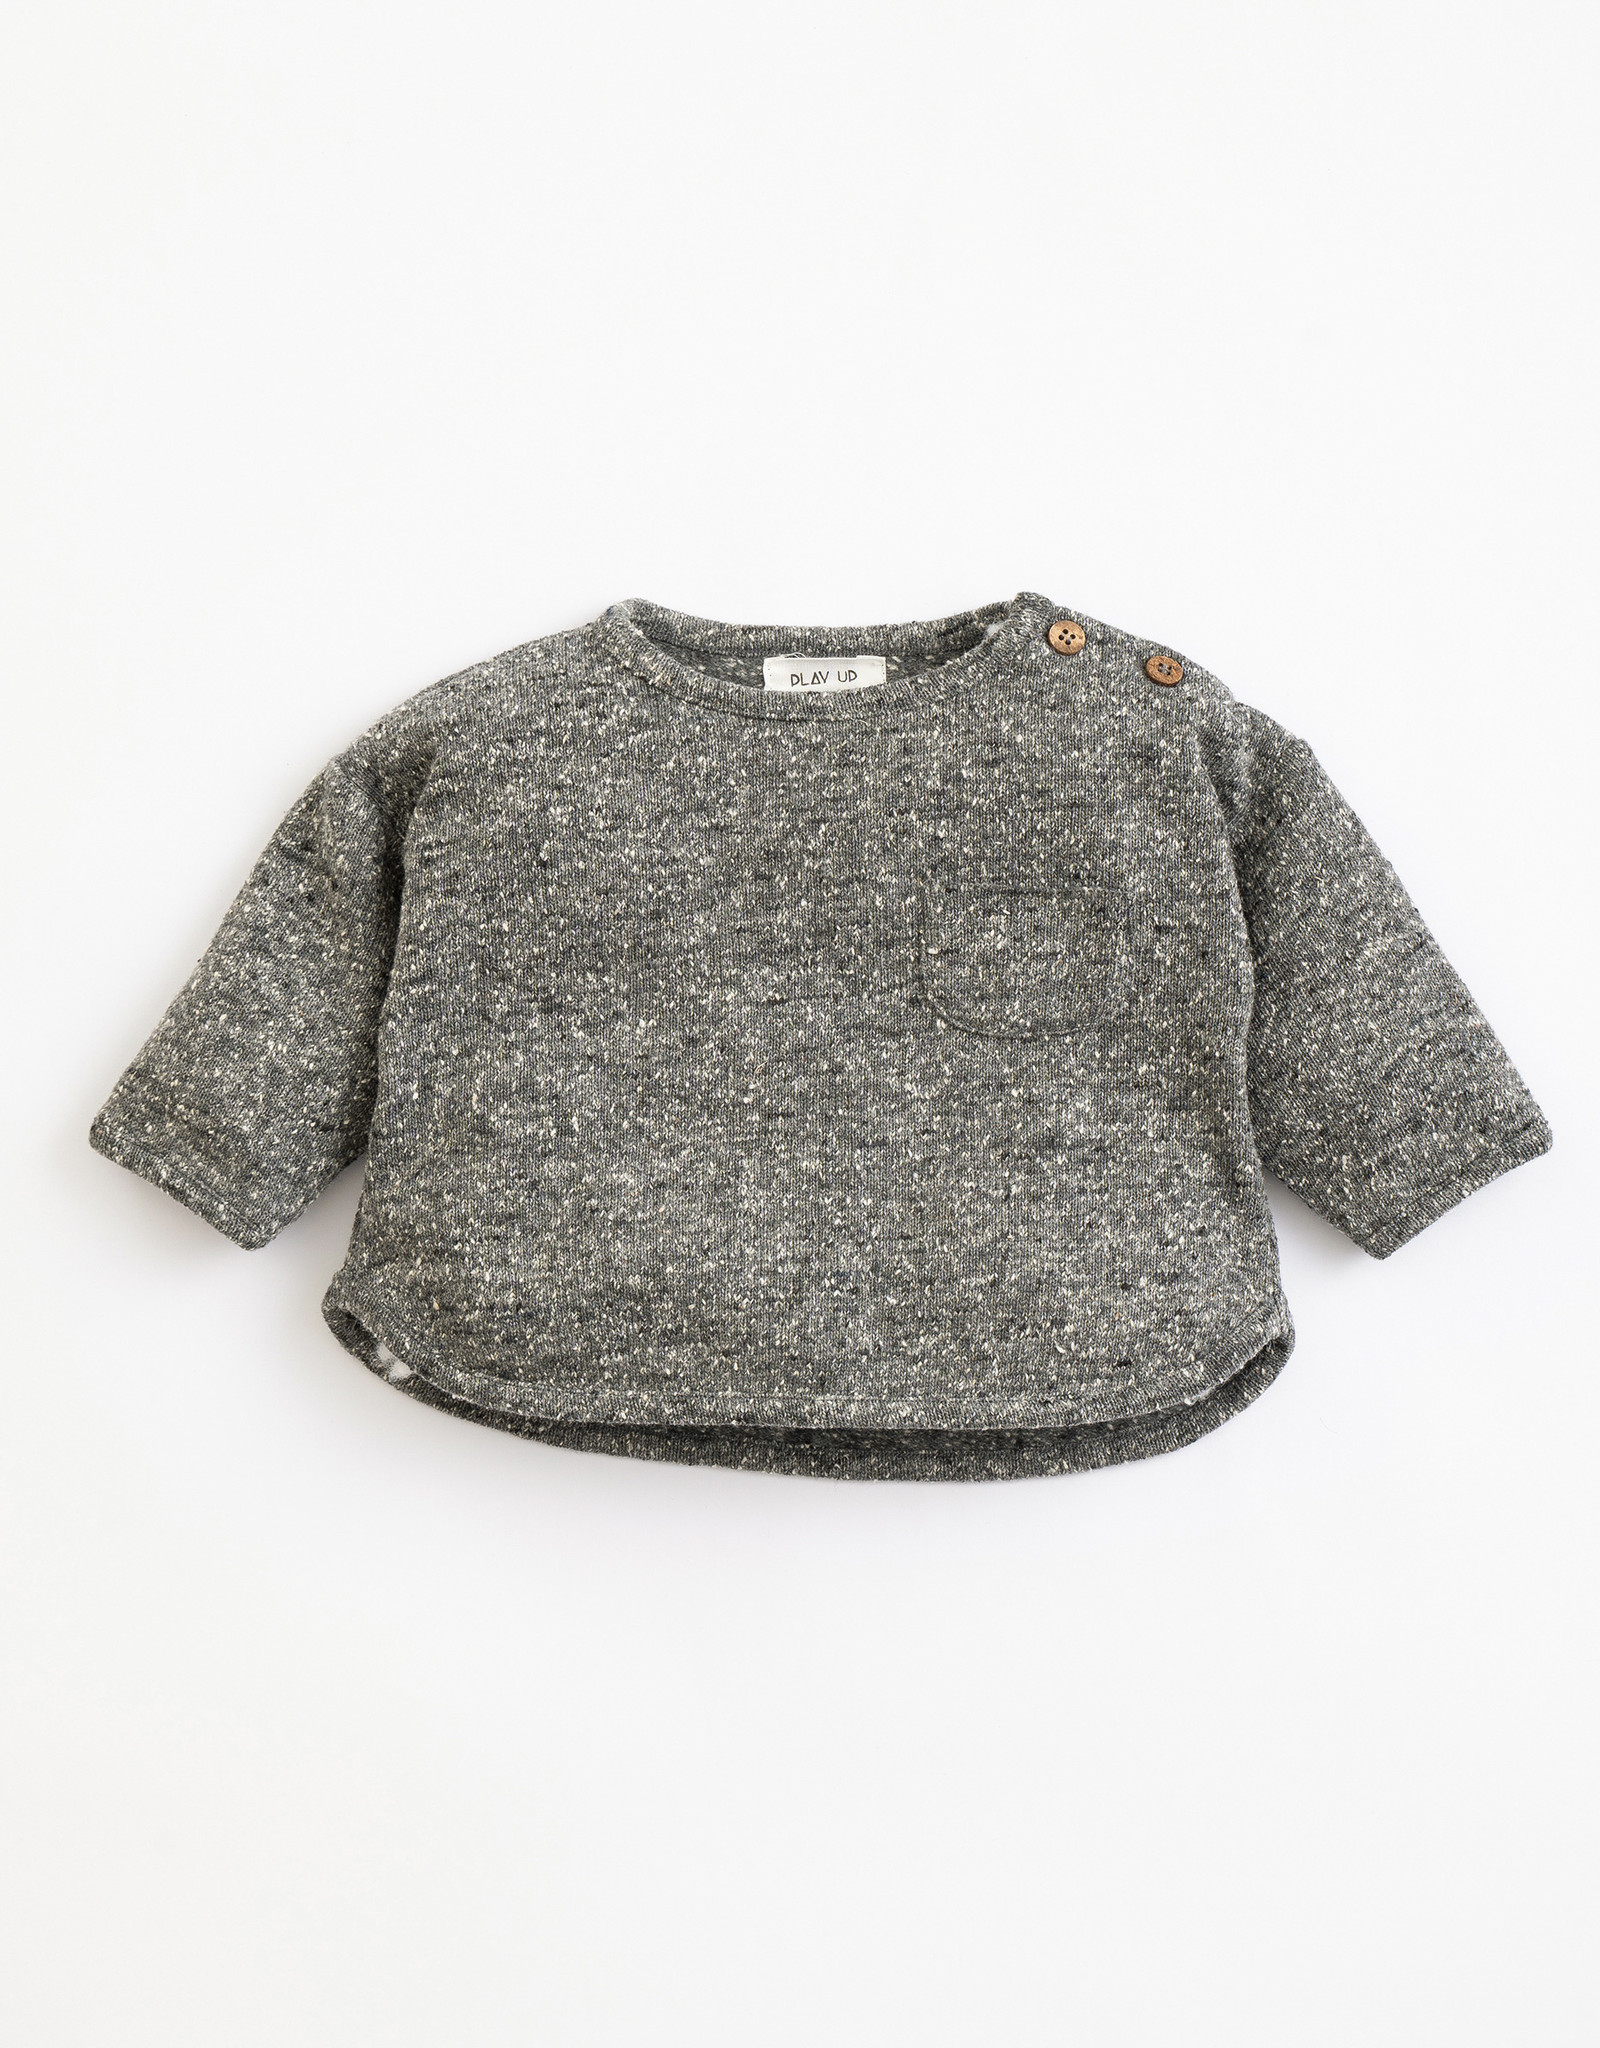 Play Up Play Up sweater met spikkelprint frame